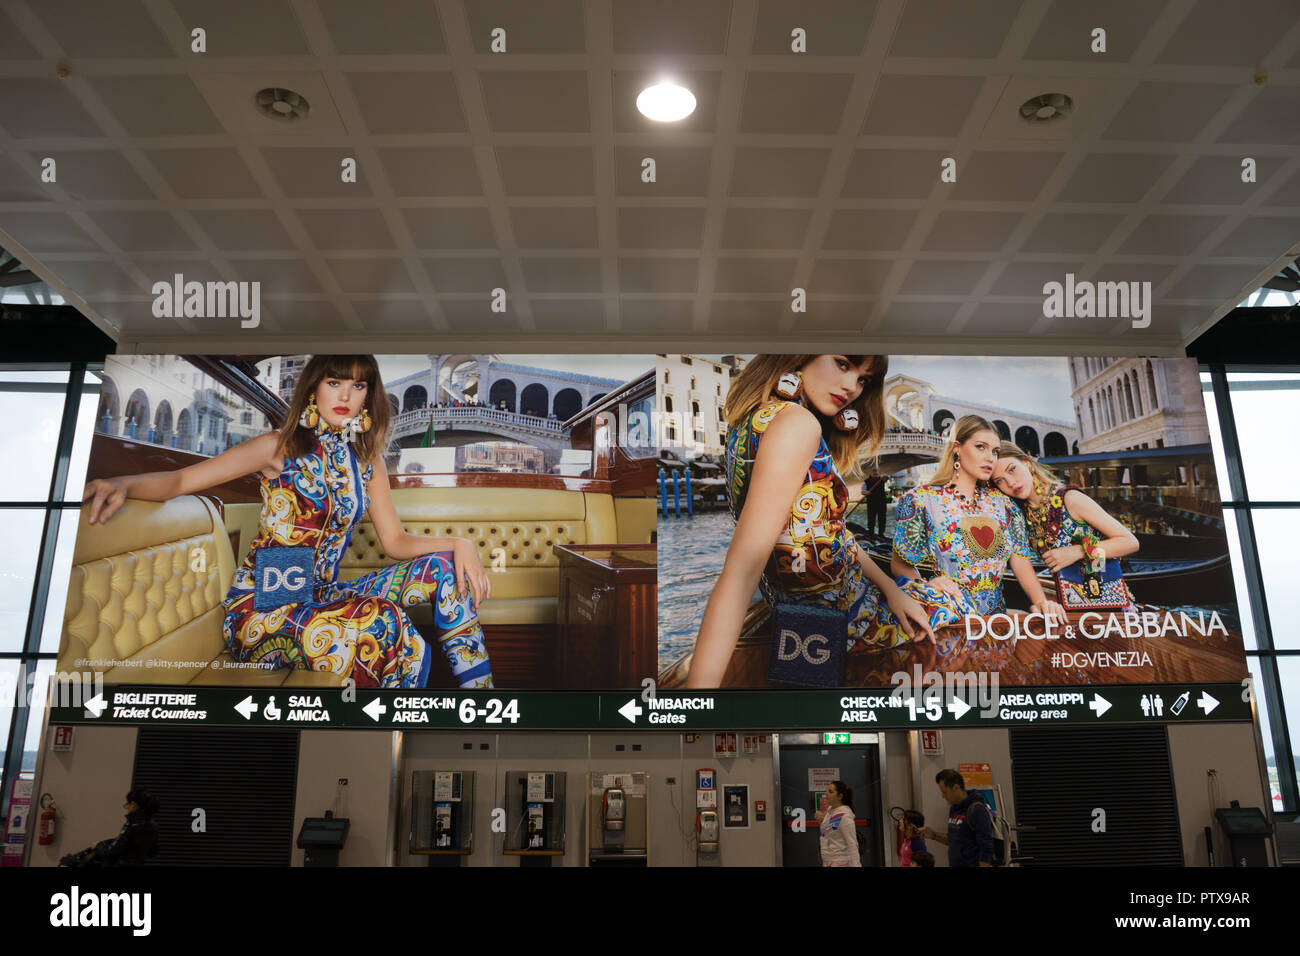 Milan Airport, Italy-April 2, 2018: Dolce and Gabbana advertisement at The milan Malpensa Airport - Stock Image